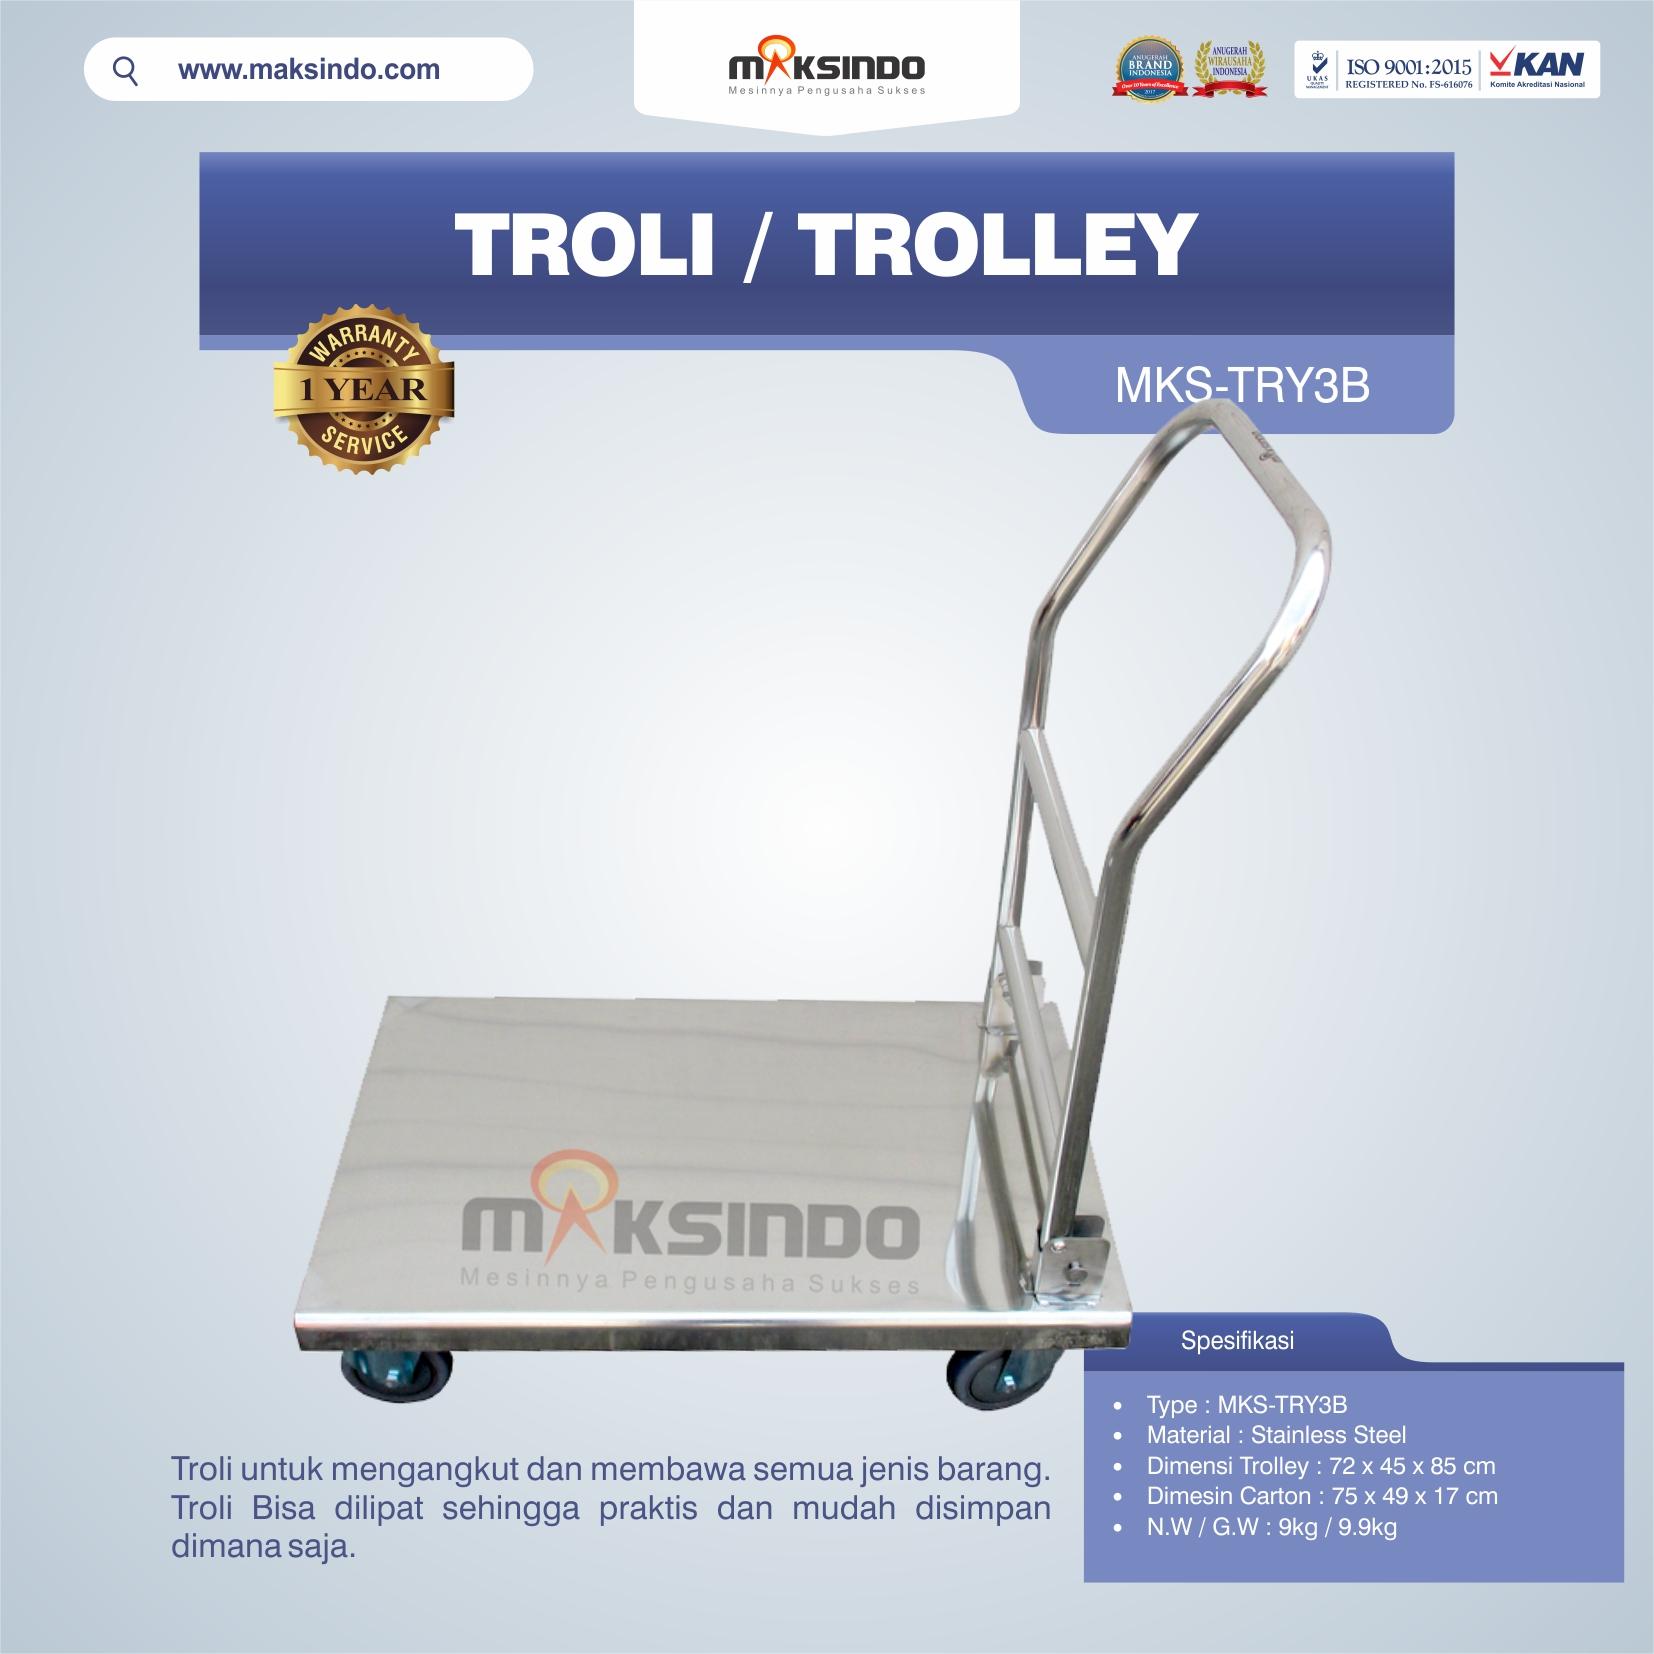 Jual Troli/Trolley MKS-TRY3B di Pekanbaru